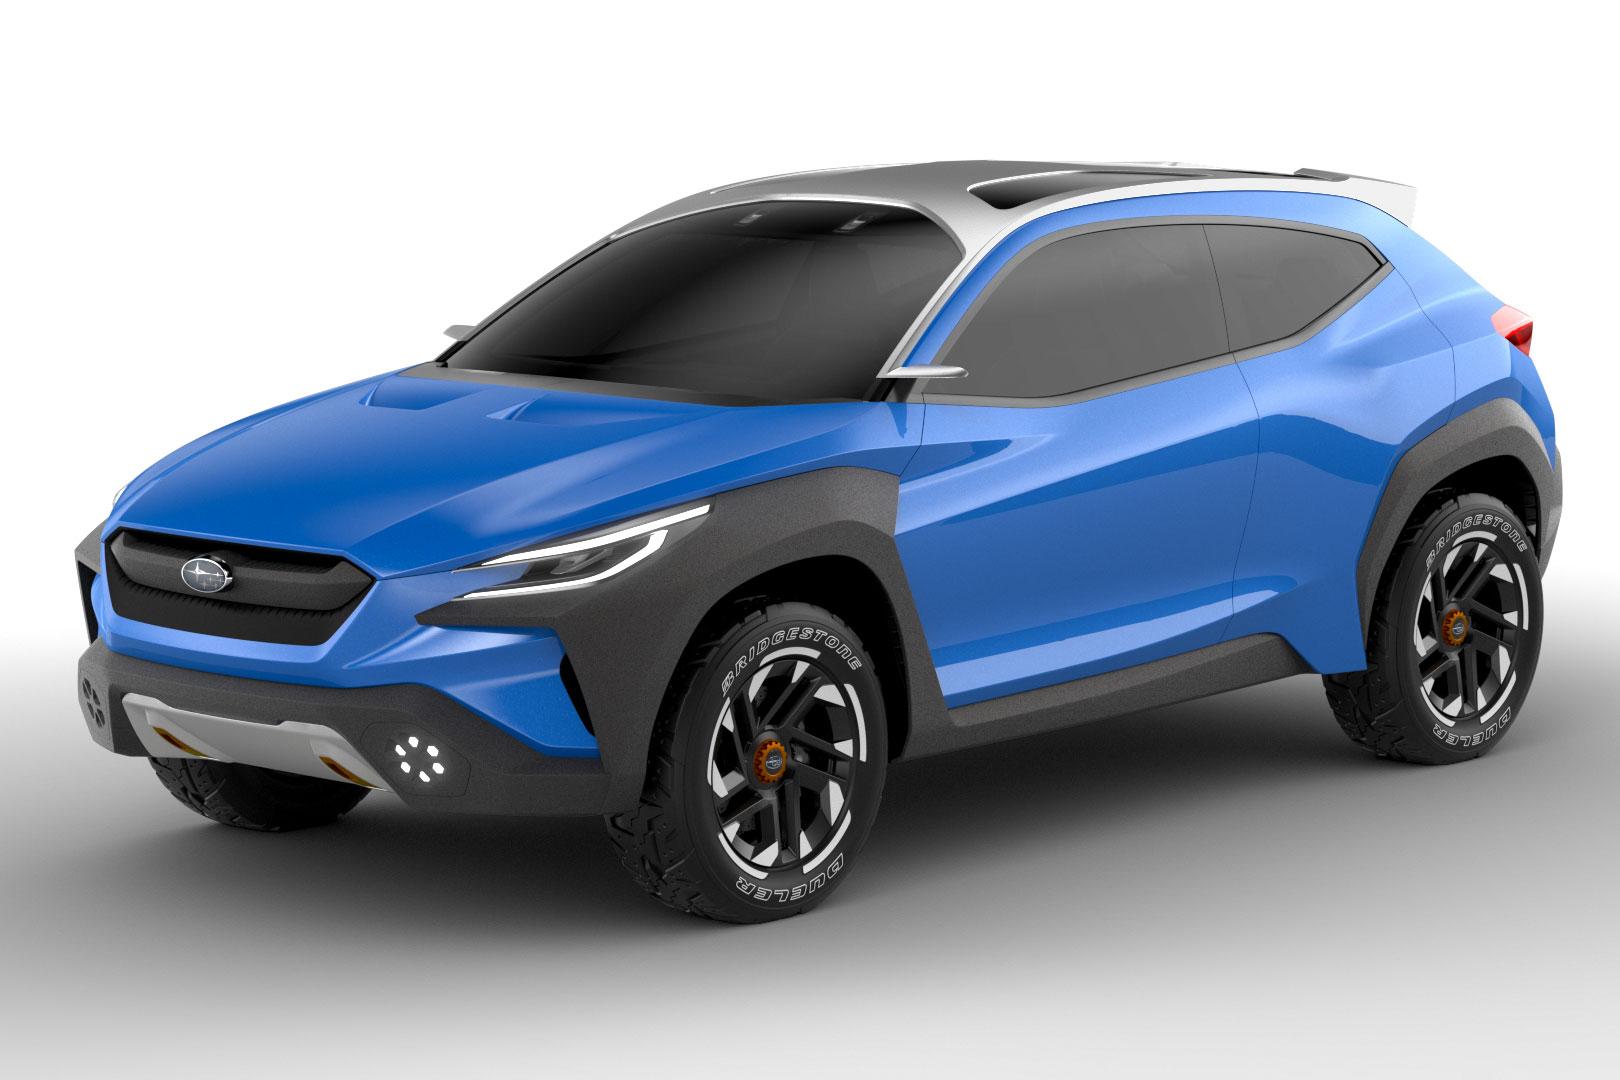 Subaru Viziv Adrenaline concept in blue